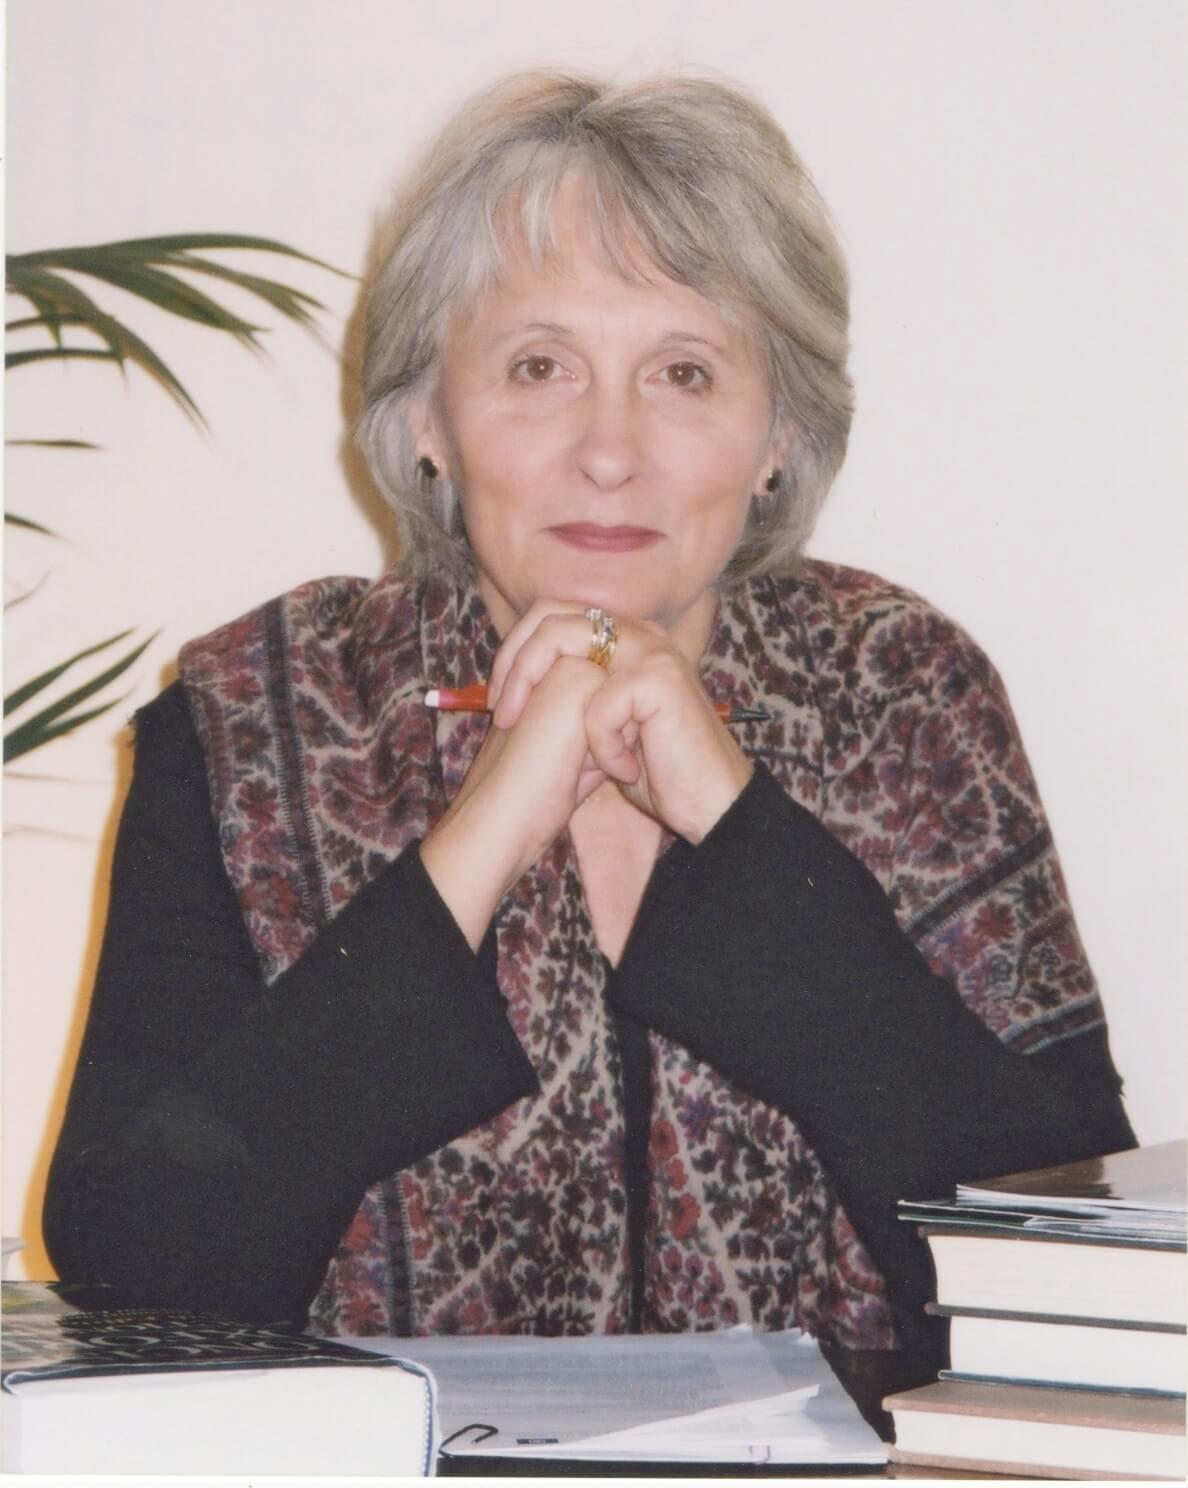 Lesley Ely